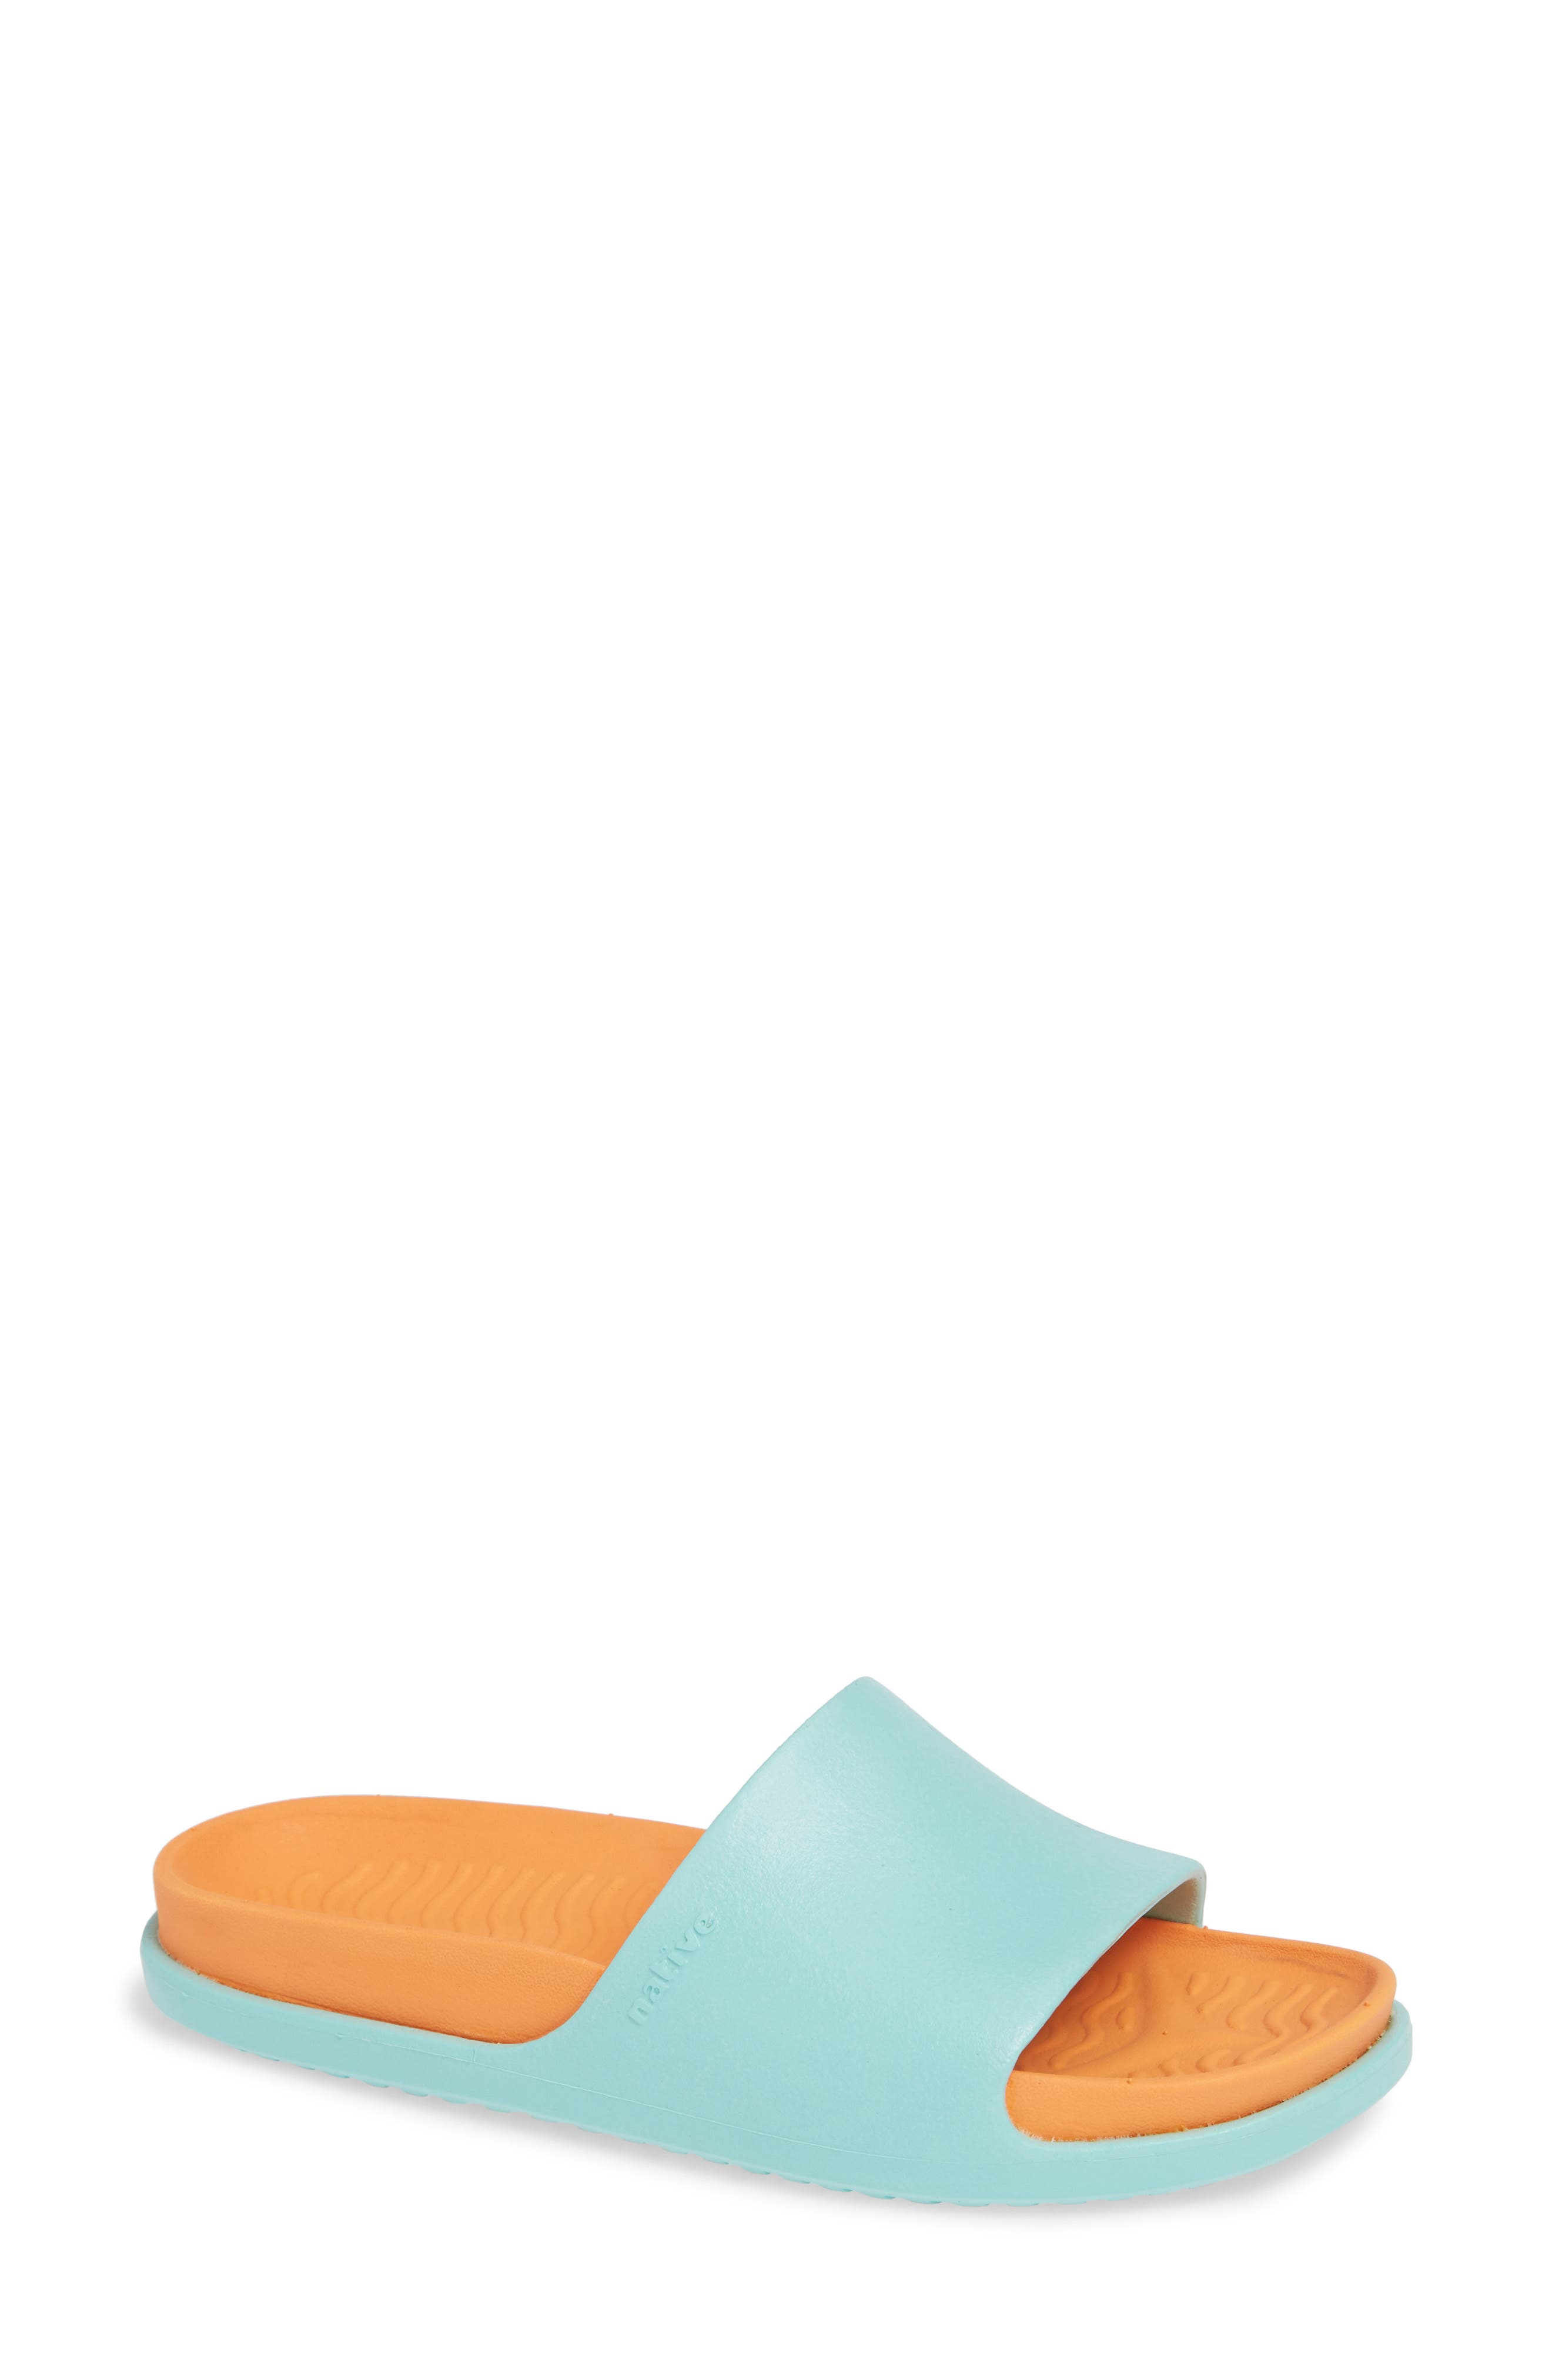 857ea3d5326 Native Shoes